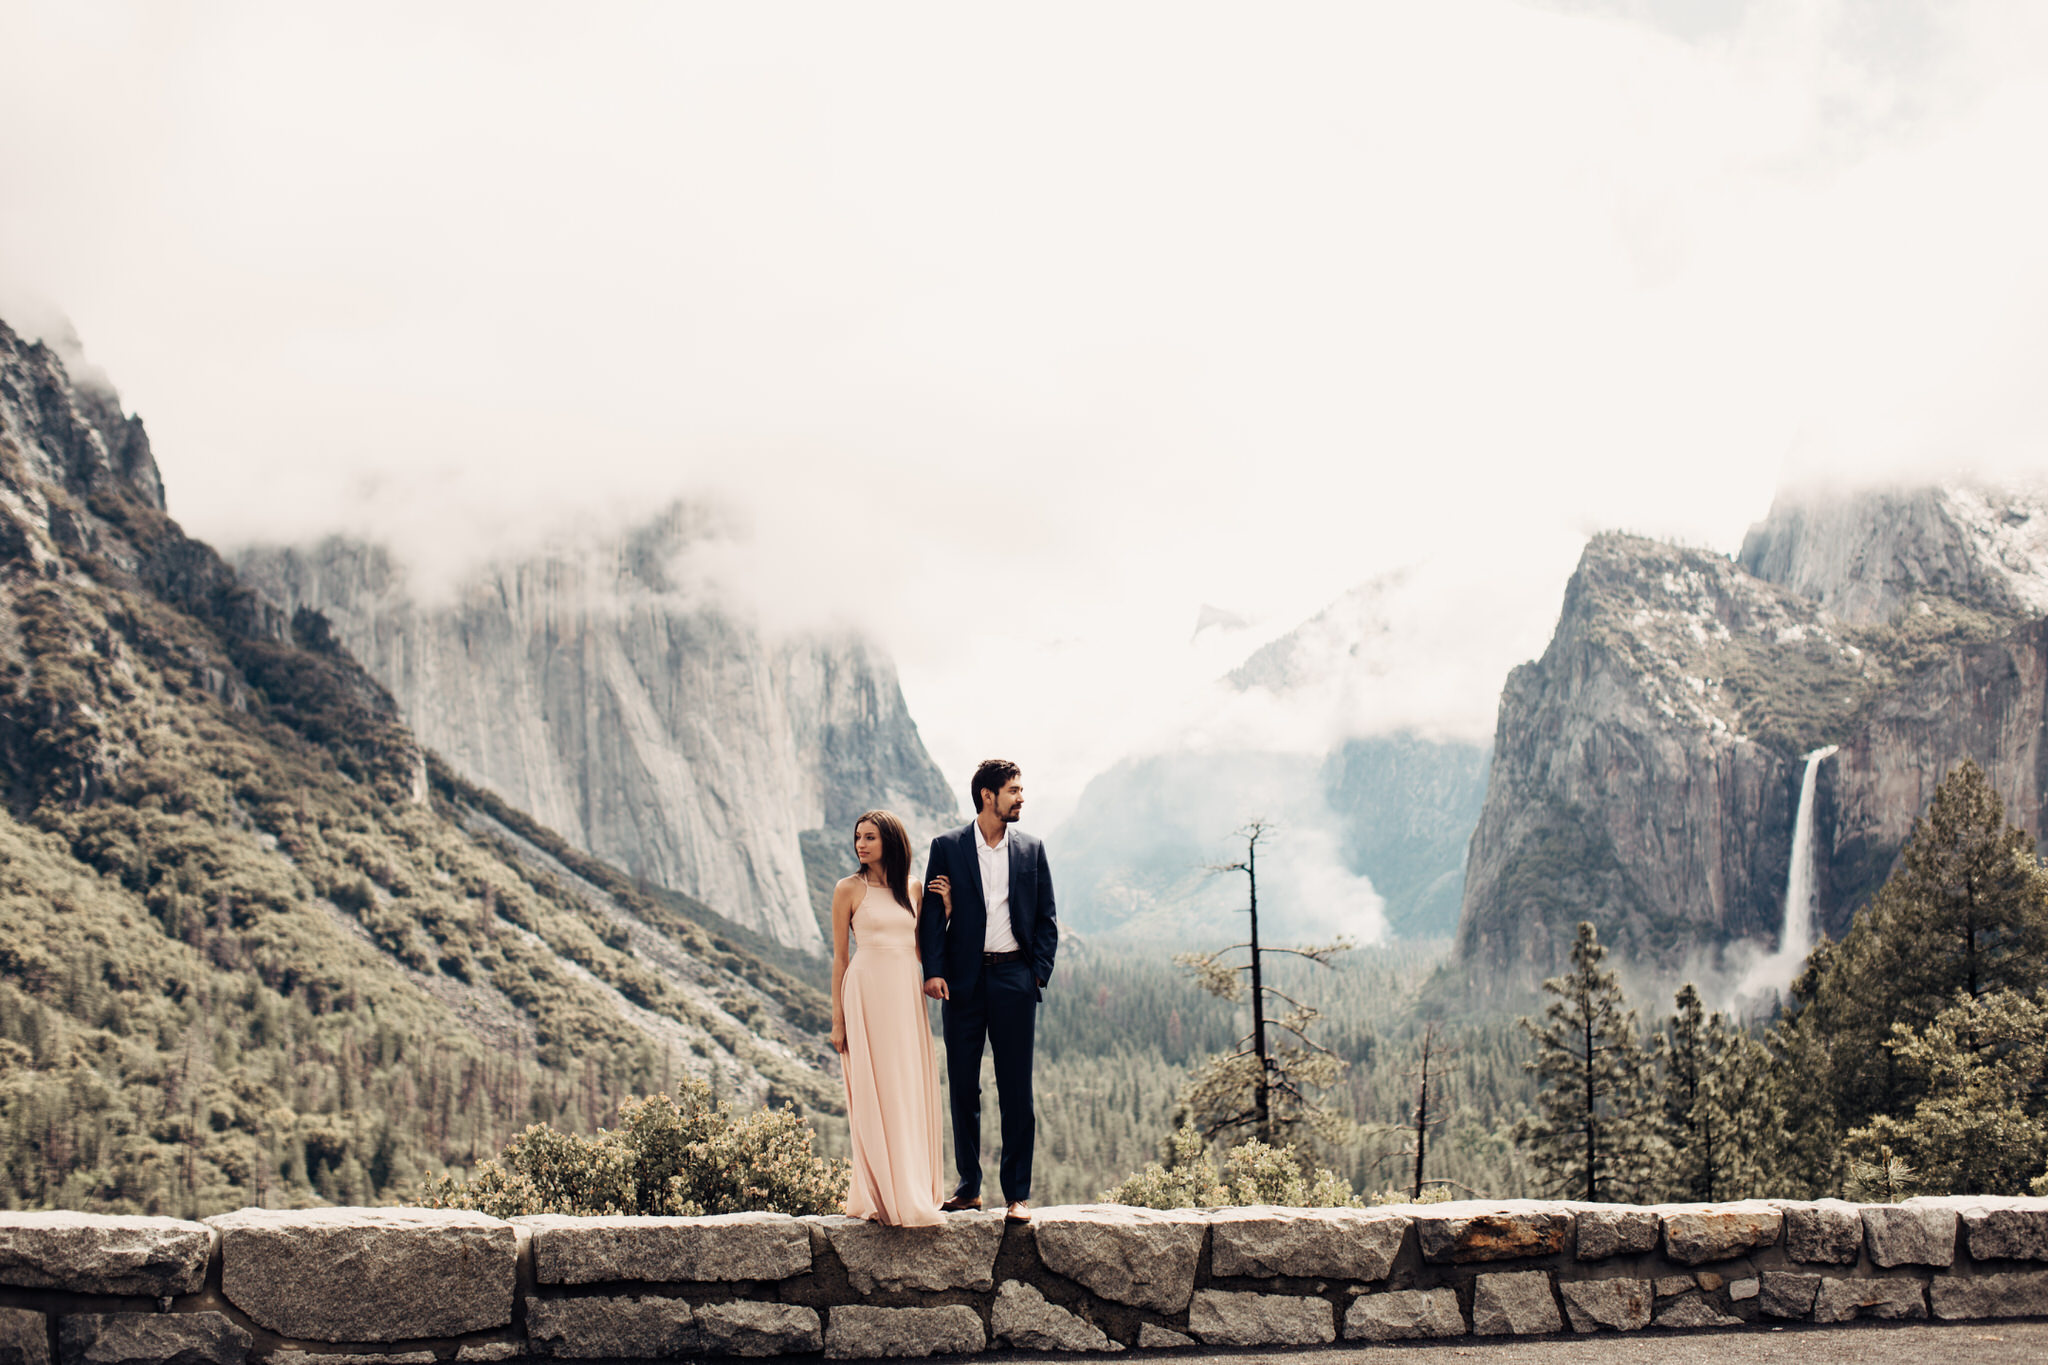 Yosemite-engagement-session-lauren-and-tom82.jpg